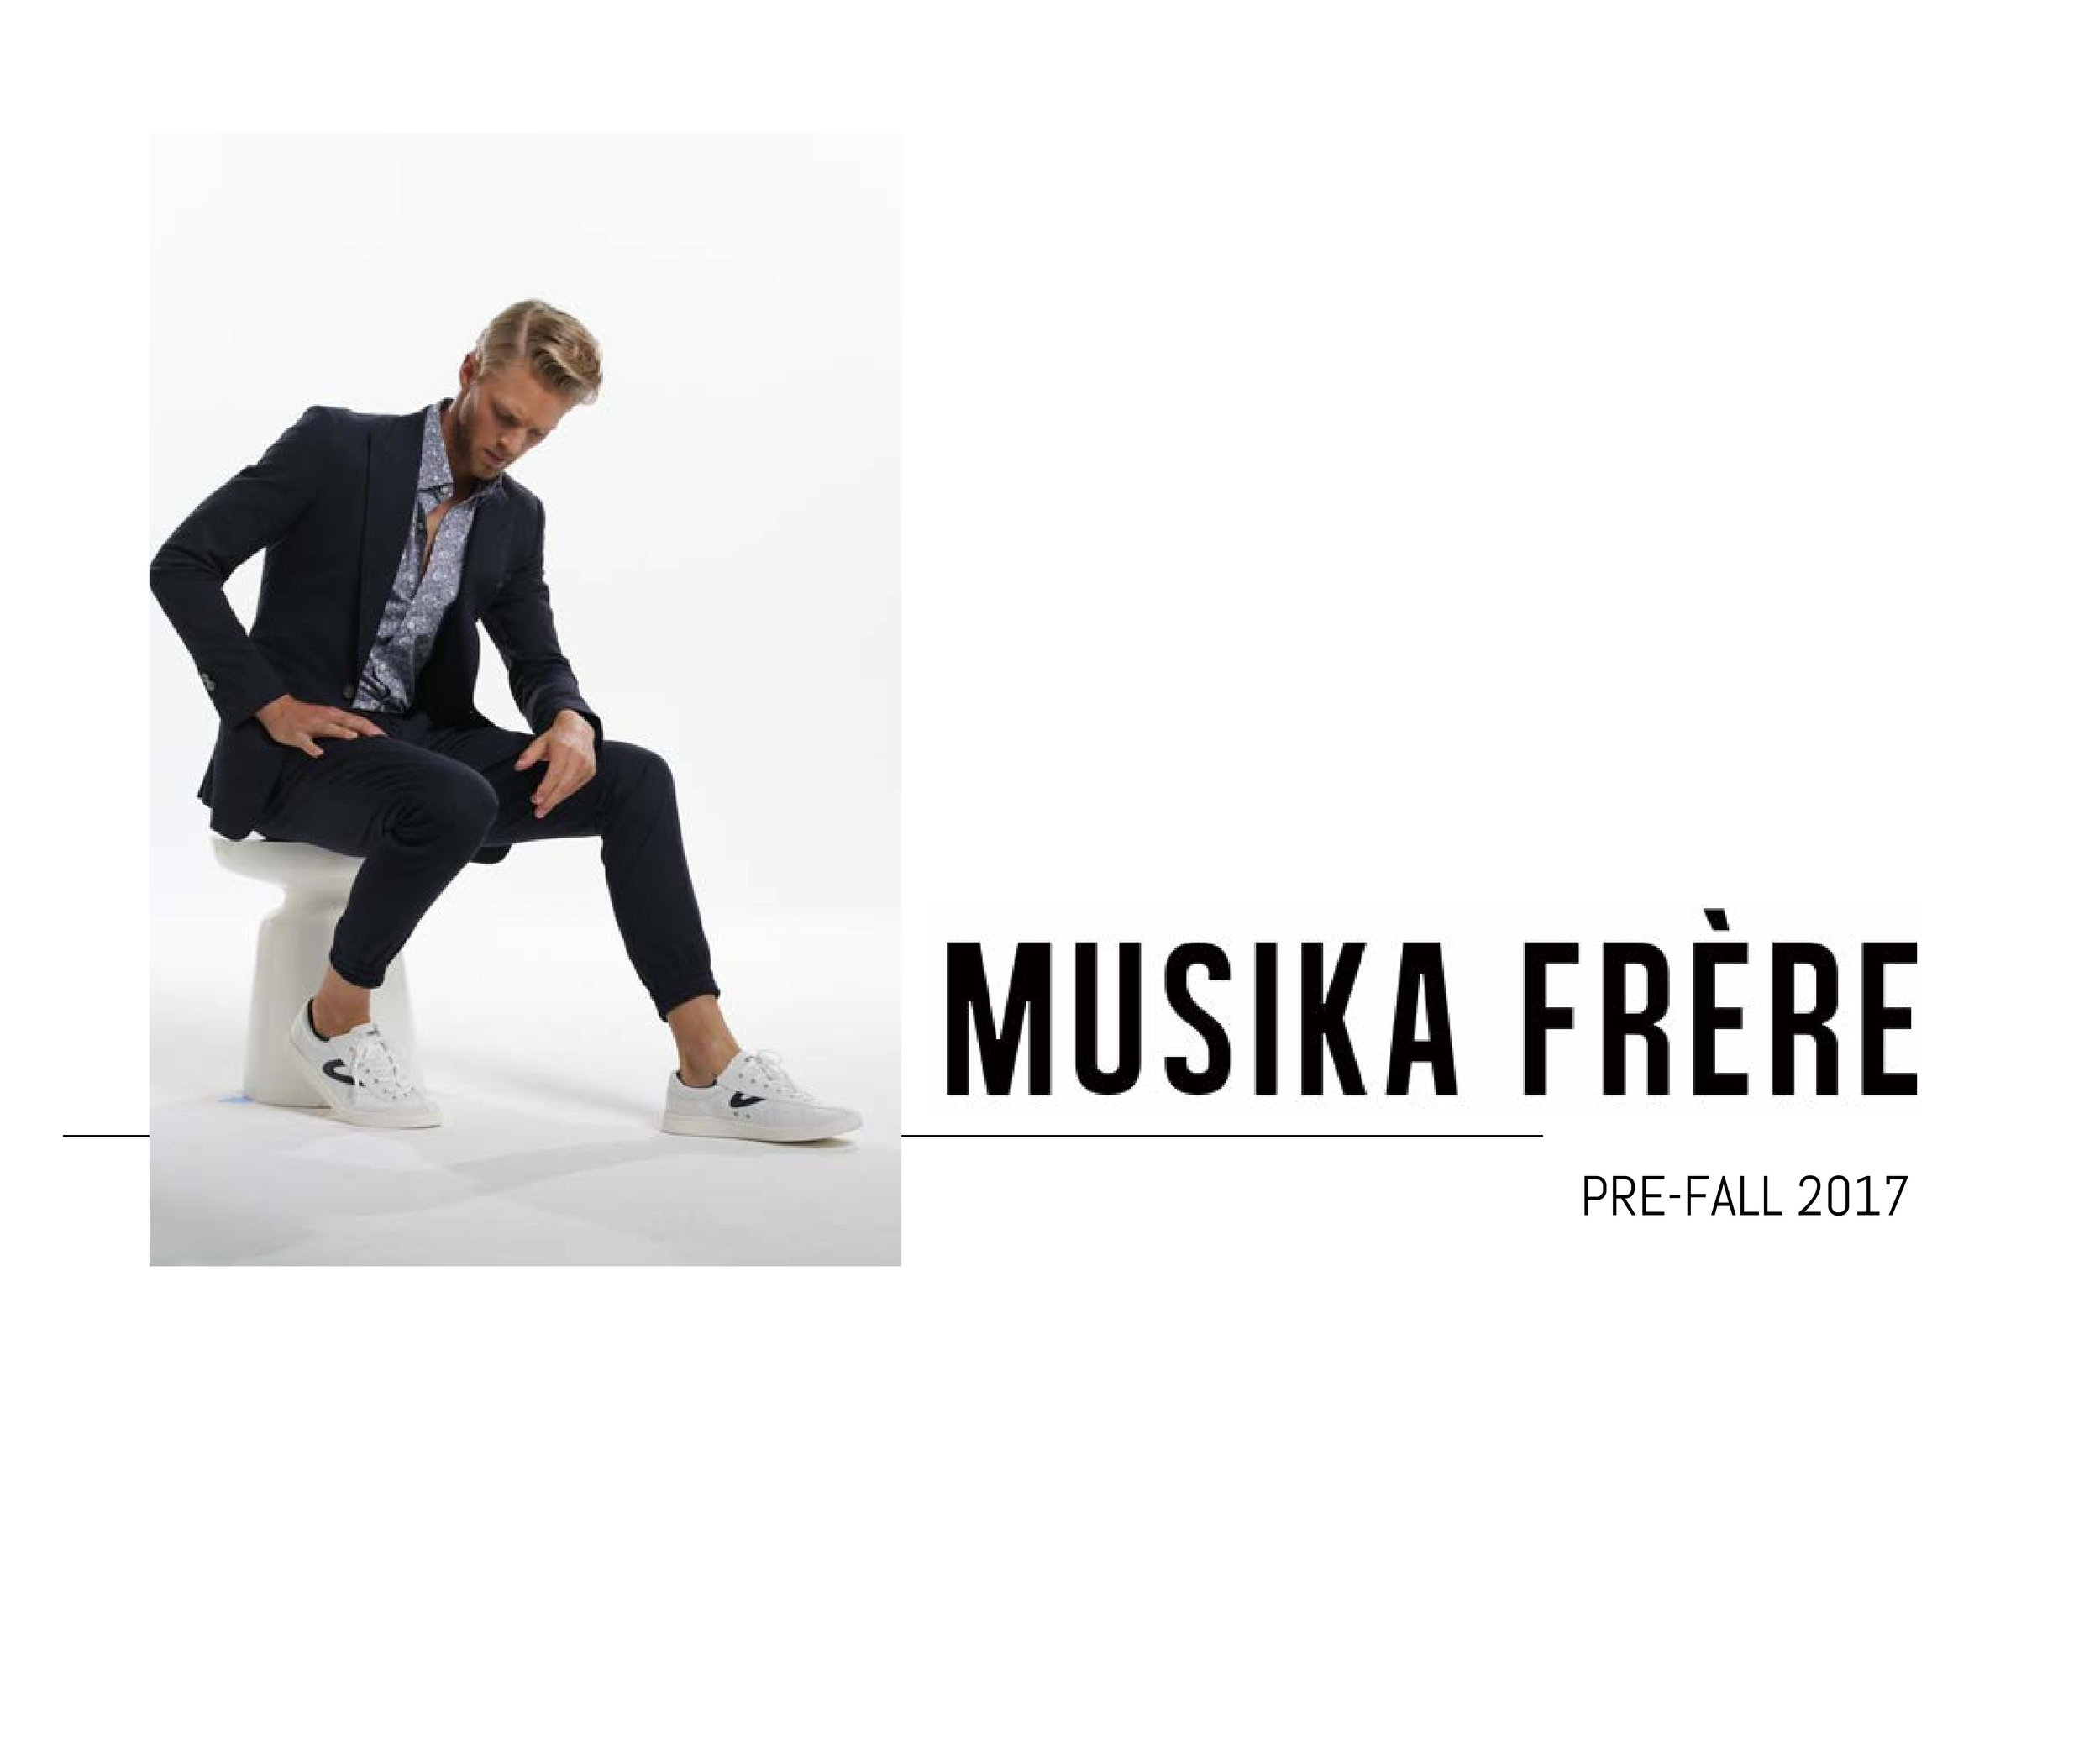 MUSIKA FRERE FALL 2017 lookbook-page-001.jpg